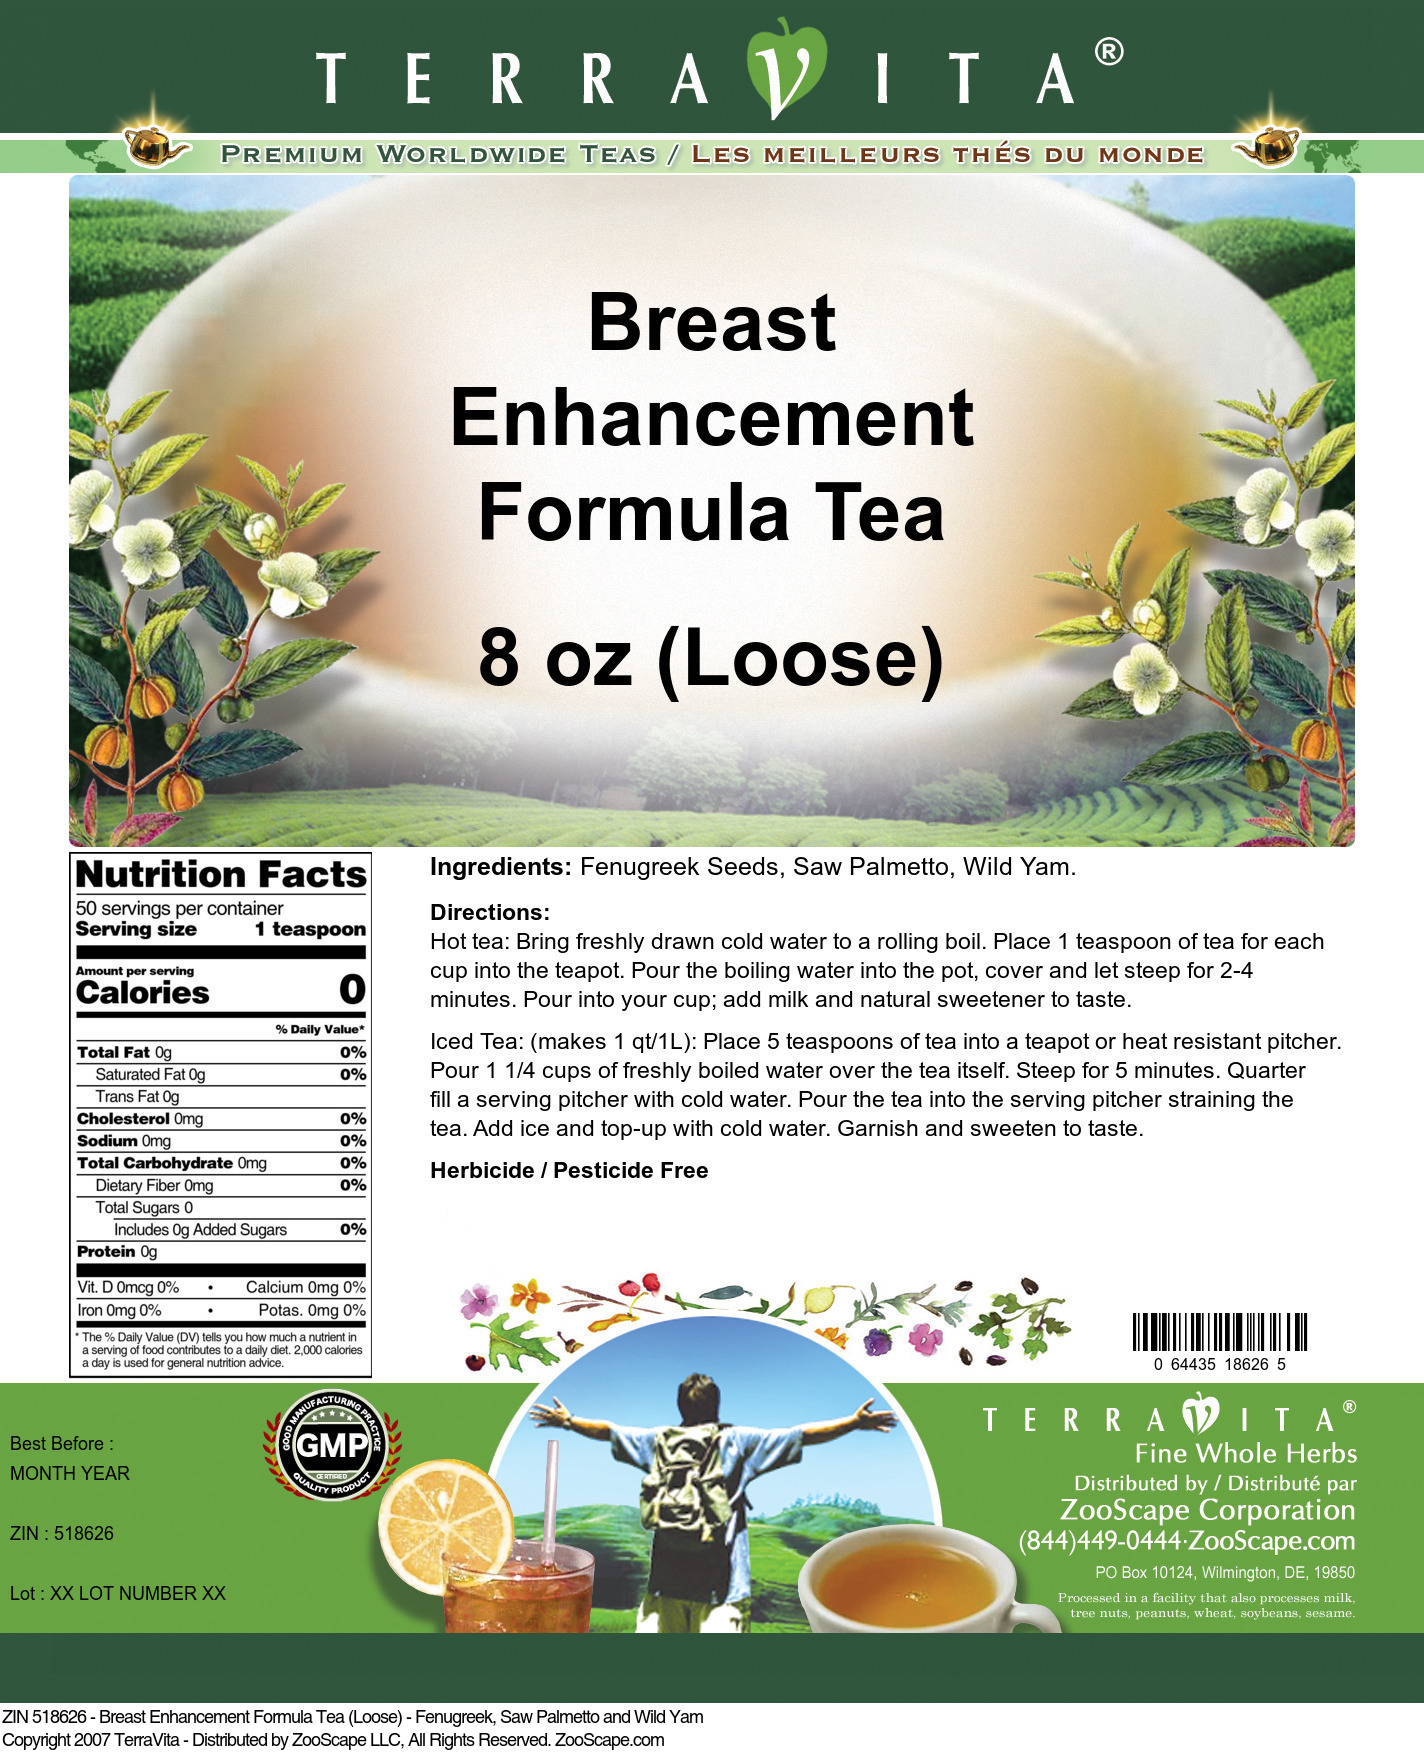 Breast Enhancement Formula